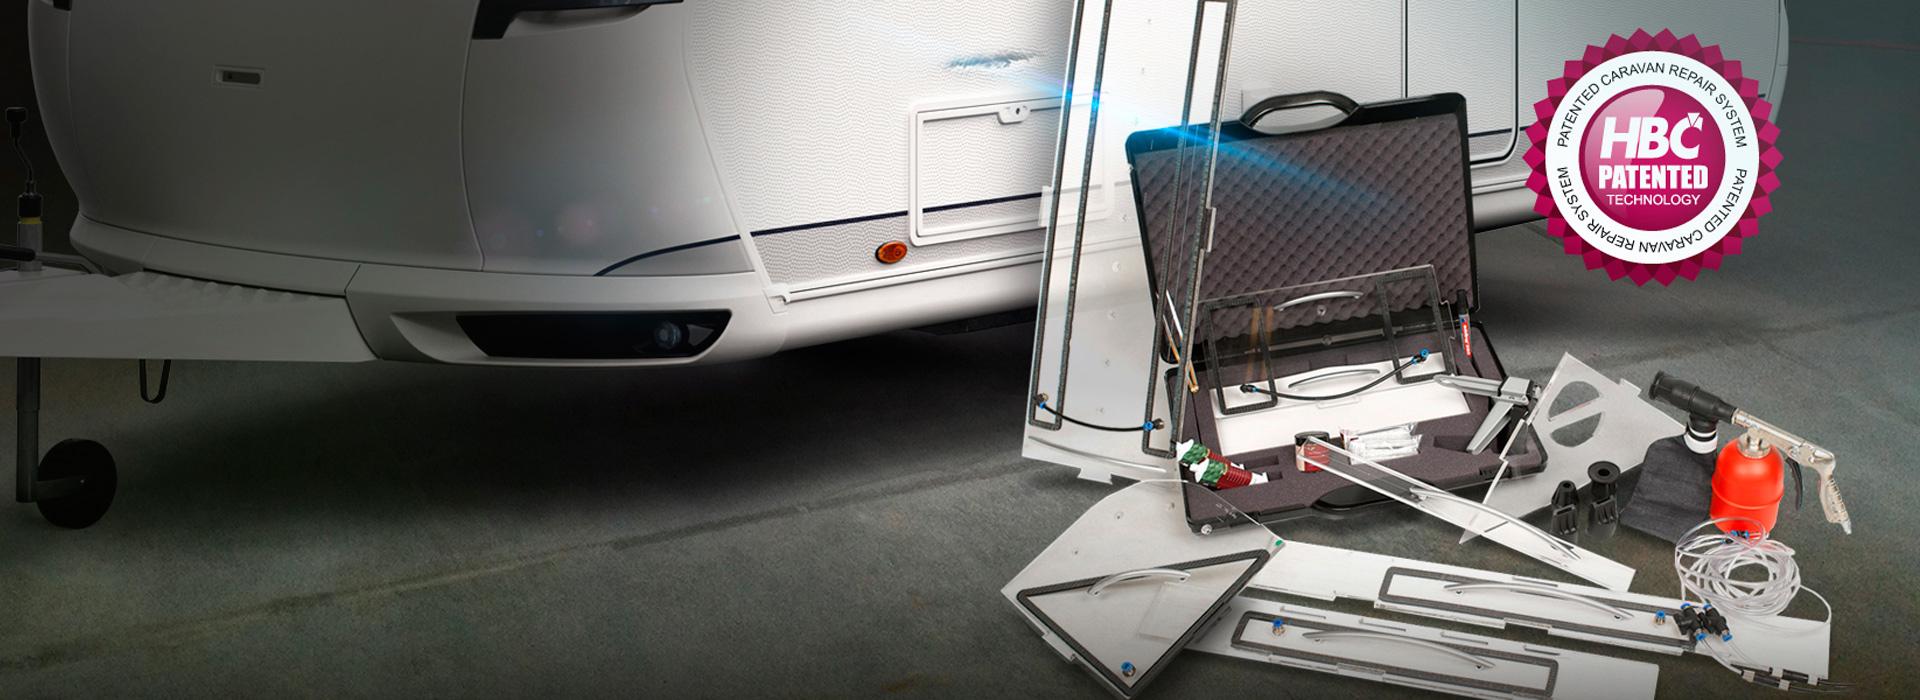 Einstiegskurs -Profi Caravan Reparatur